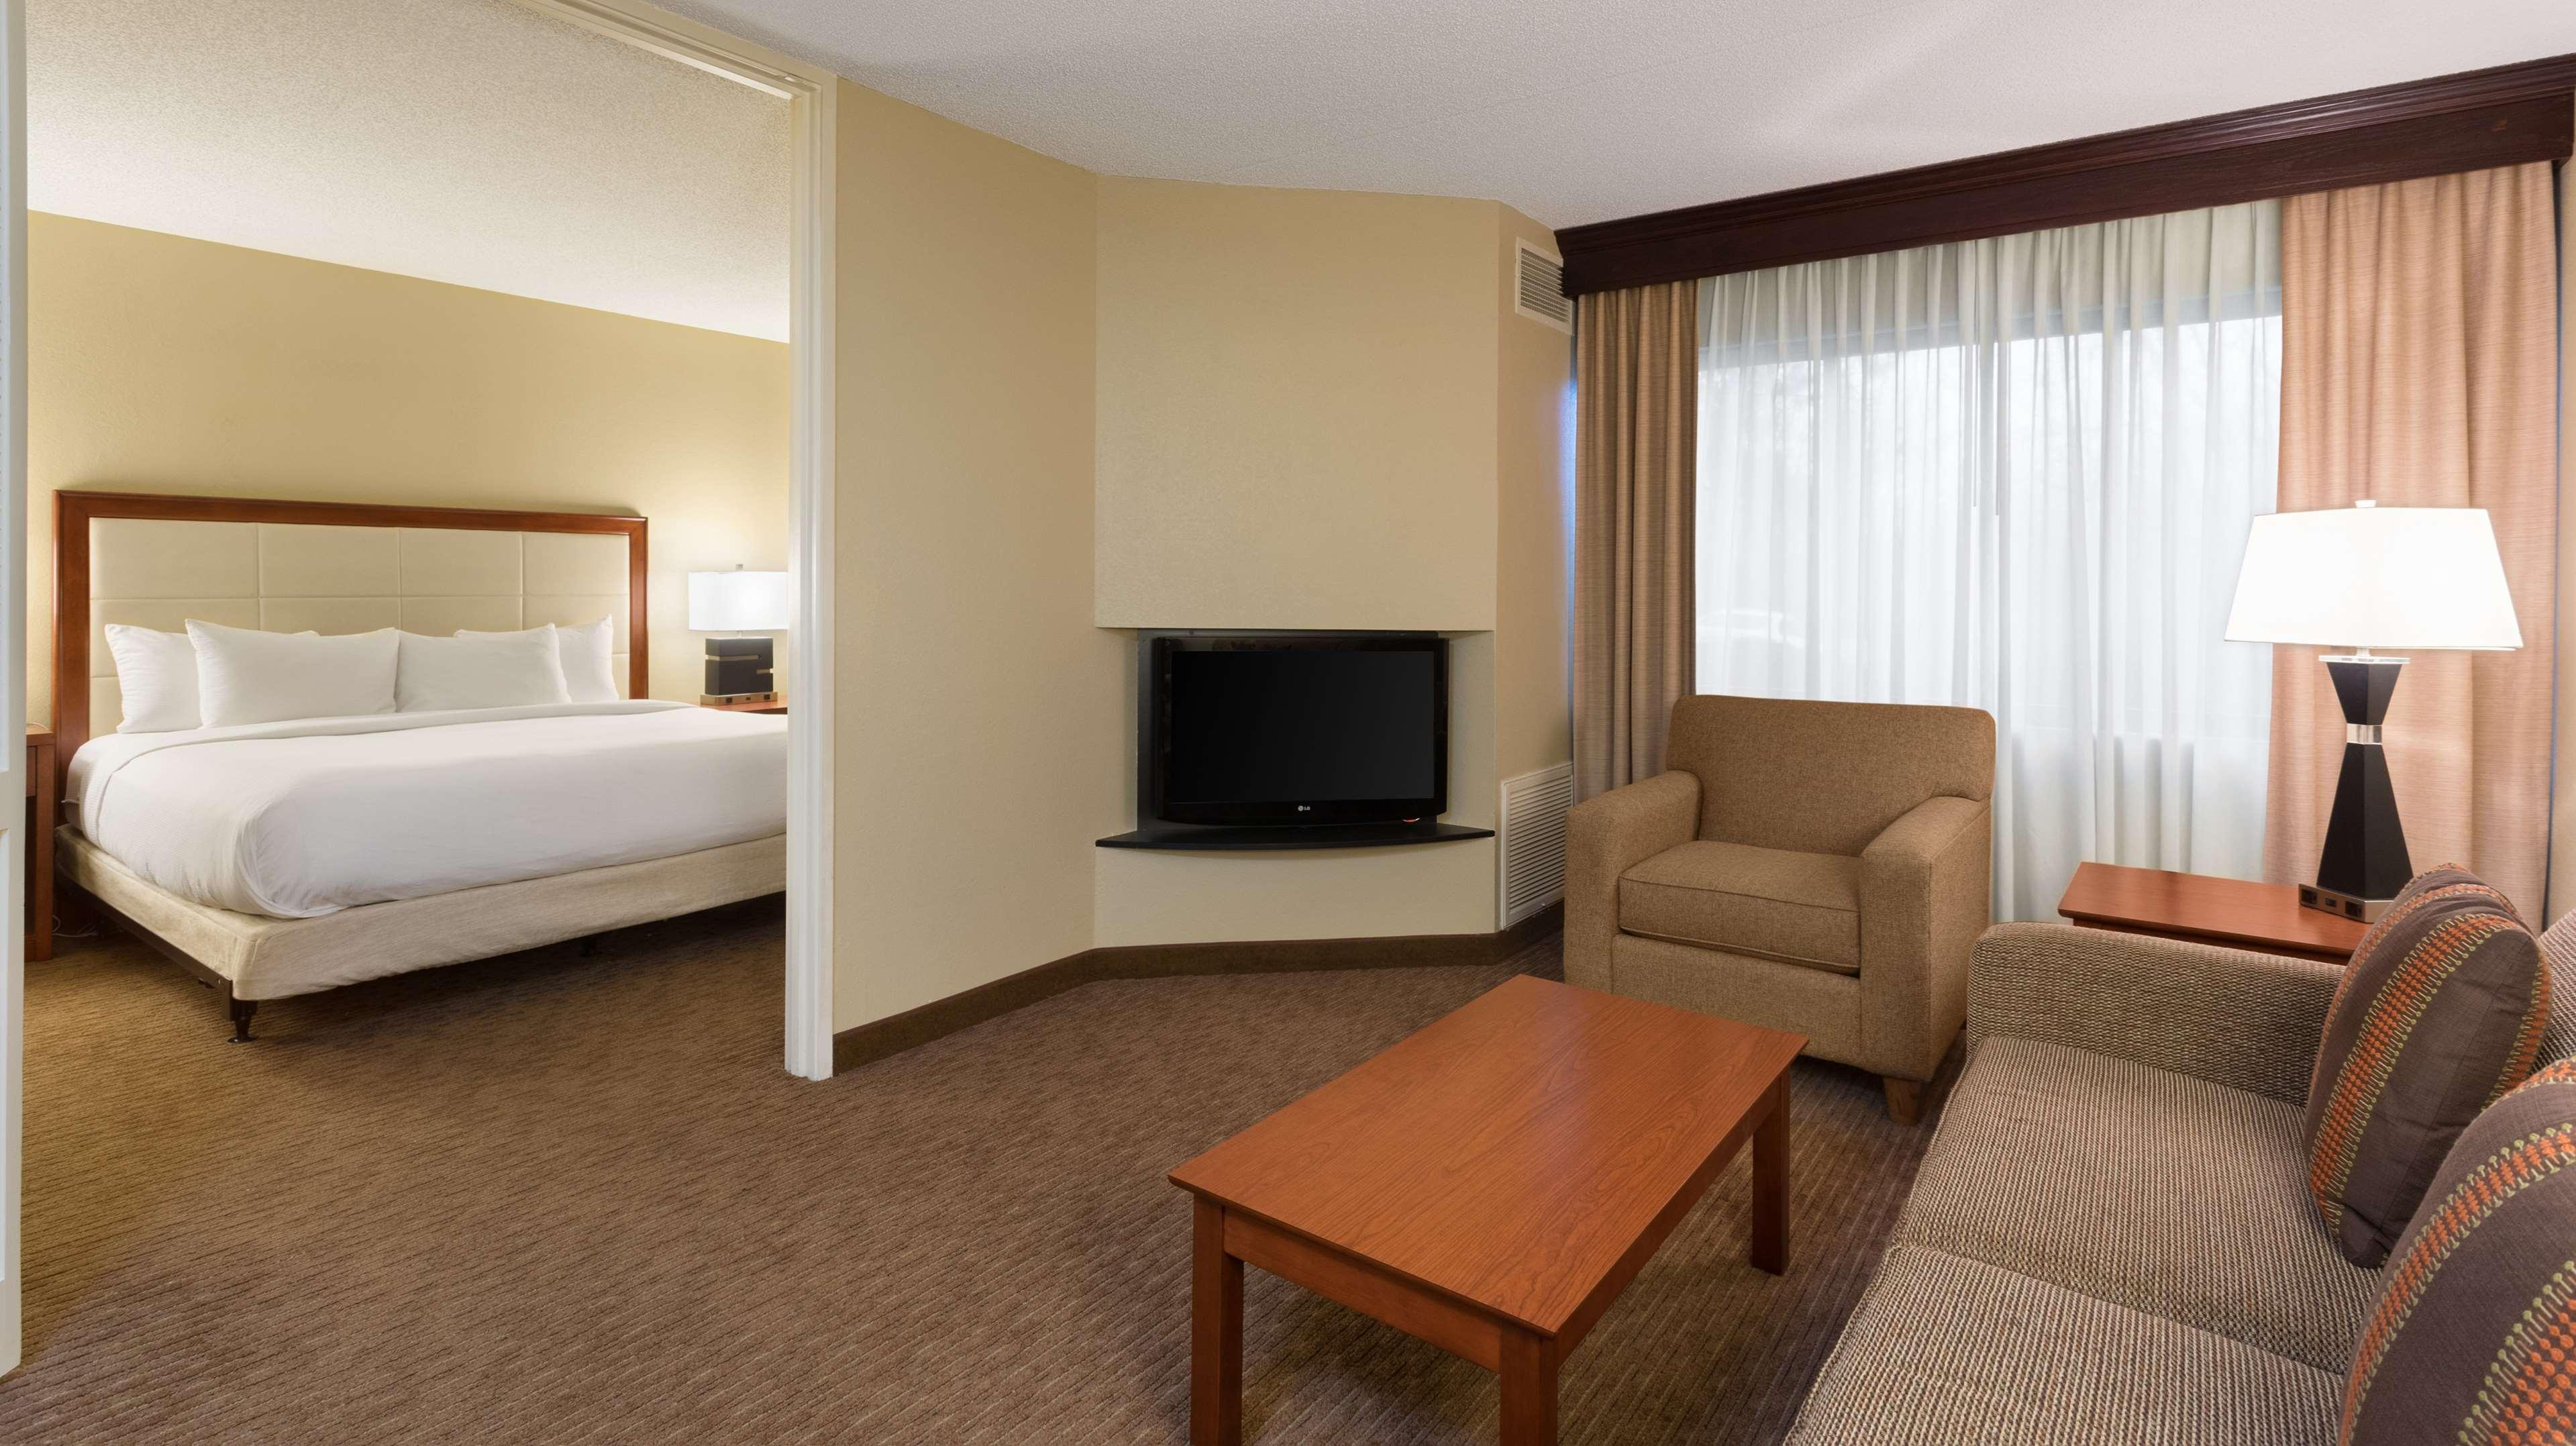 DoubleTree Suites by Hilton Hotel Cincinnati - Blue Ash image 15